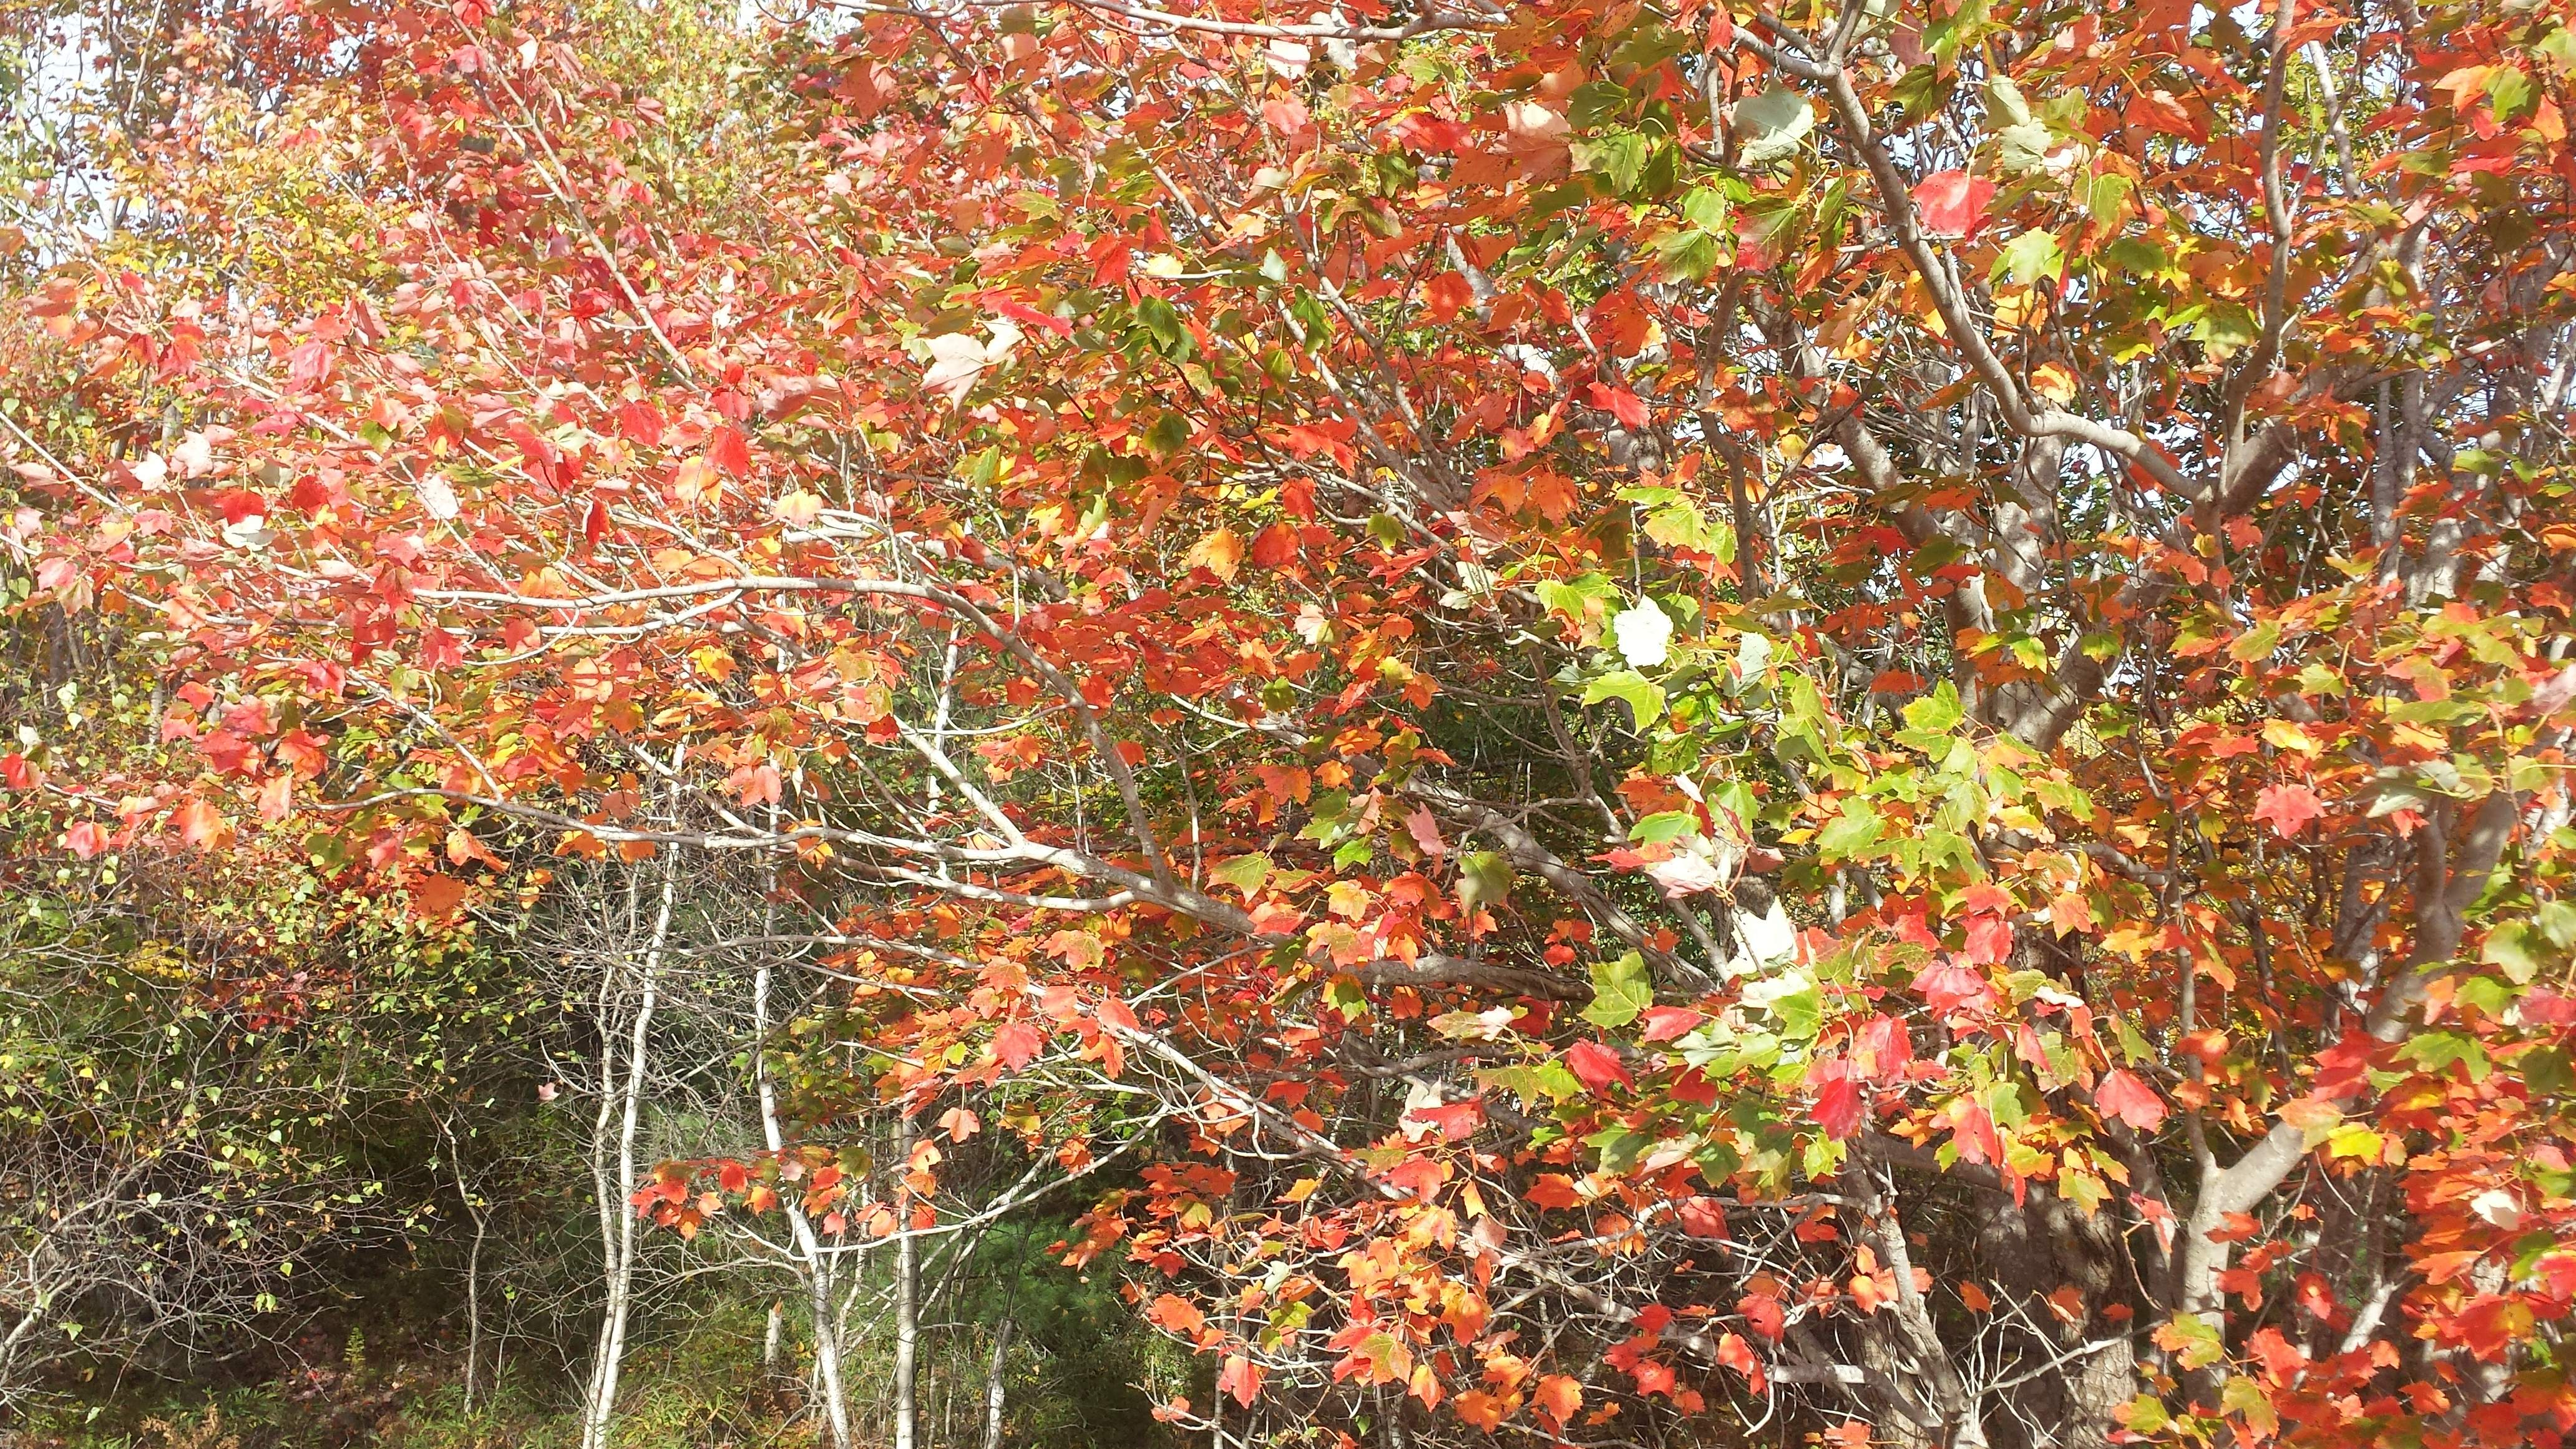 our leaf peeping trip